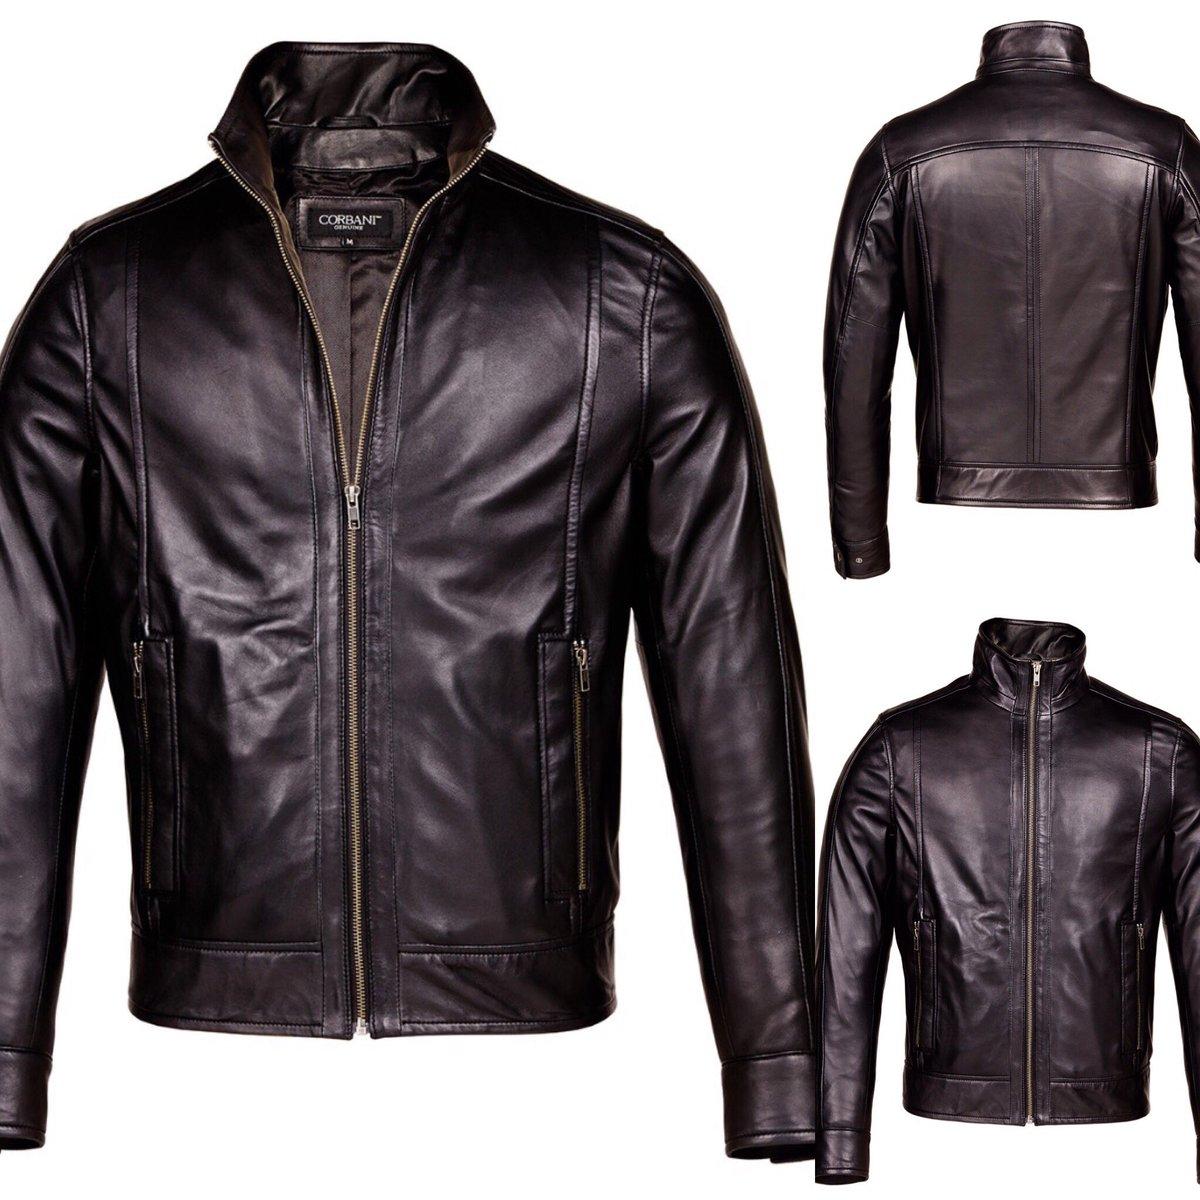 cbd5a7b37a1a  corbani  corbaniaw16  corbaniman  leather  jackets - Amazon  http   www. amazon.com shops corbaniusa … ...